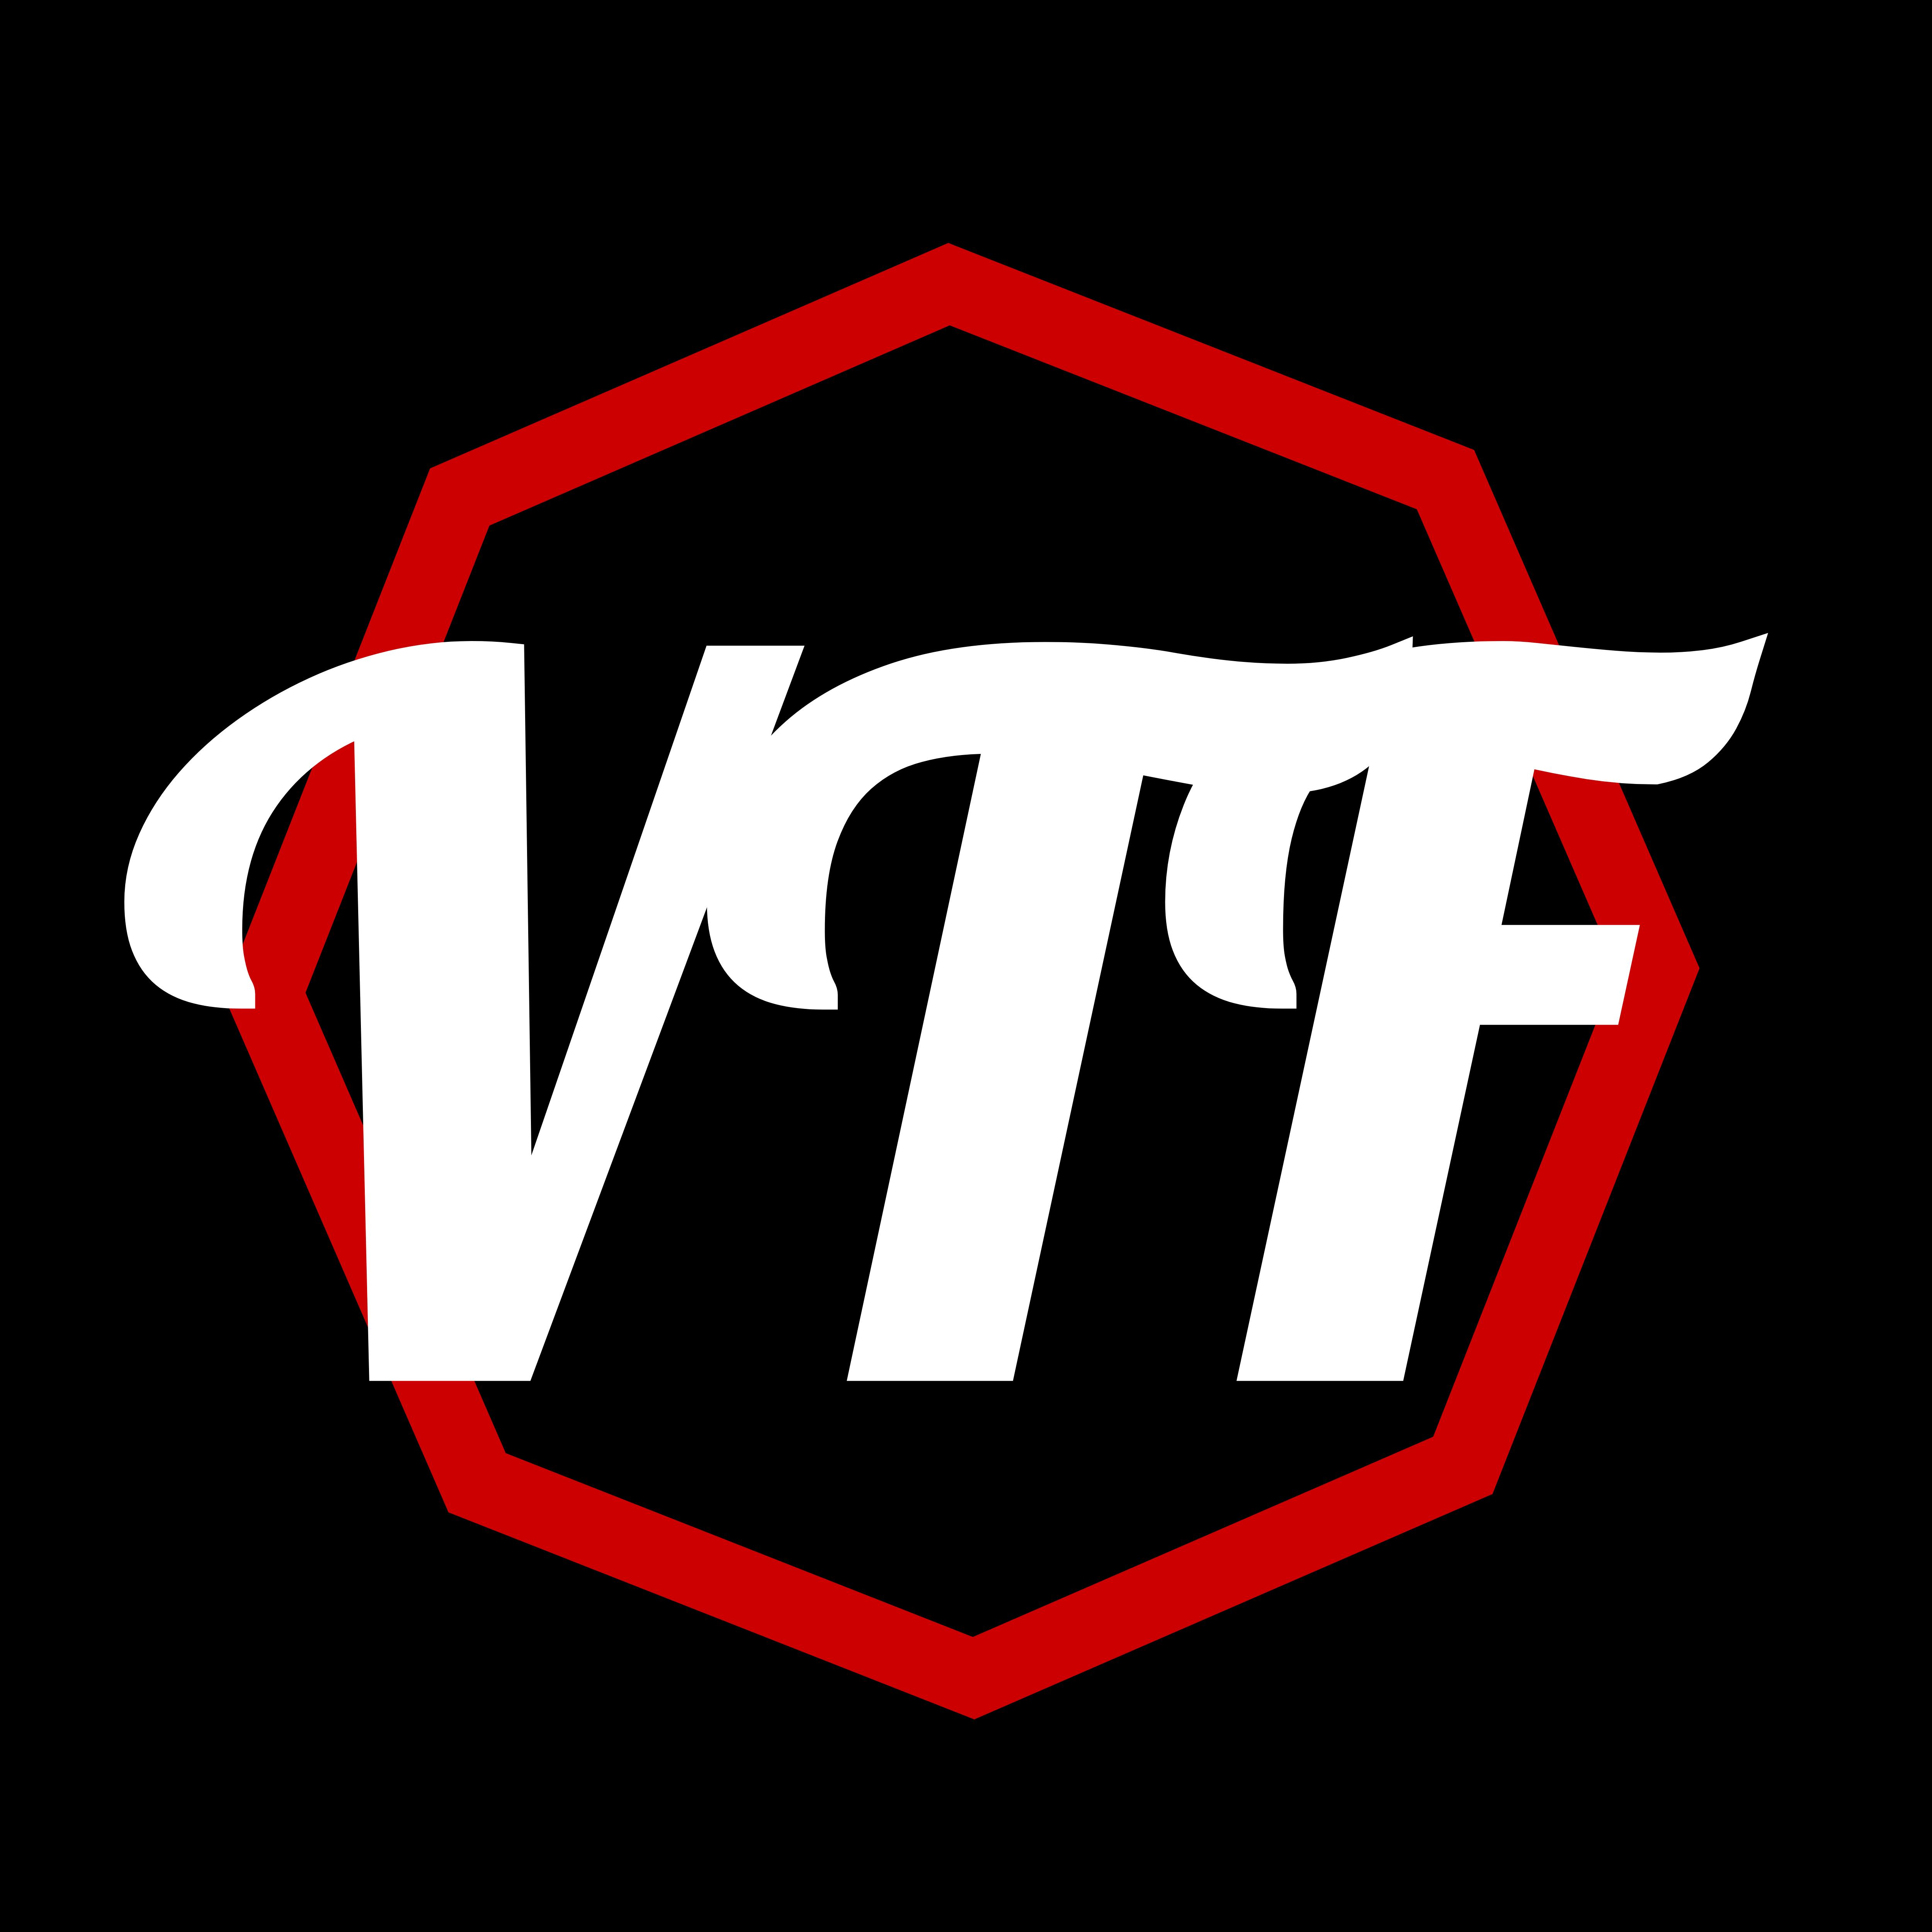 VTF (1)